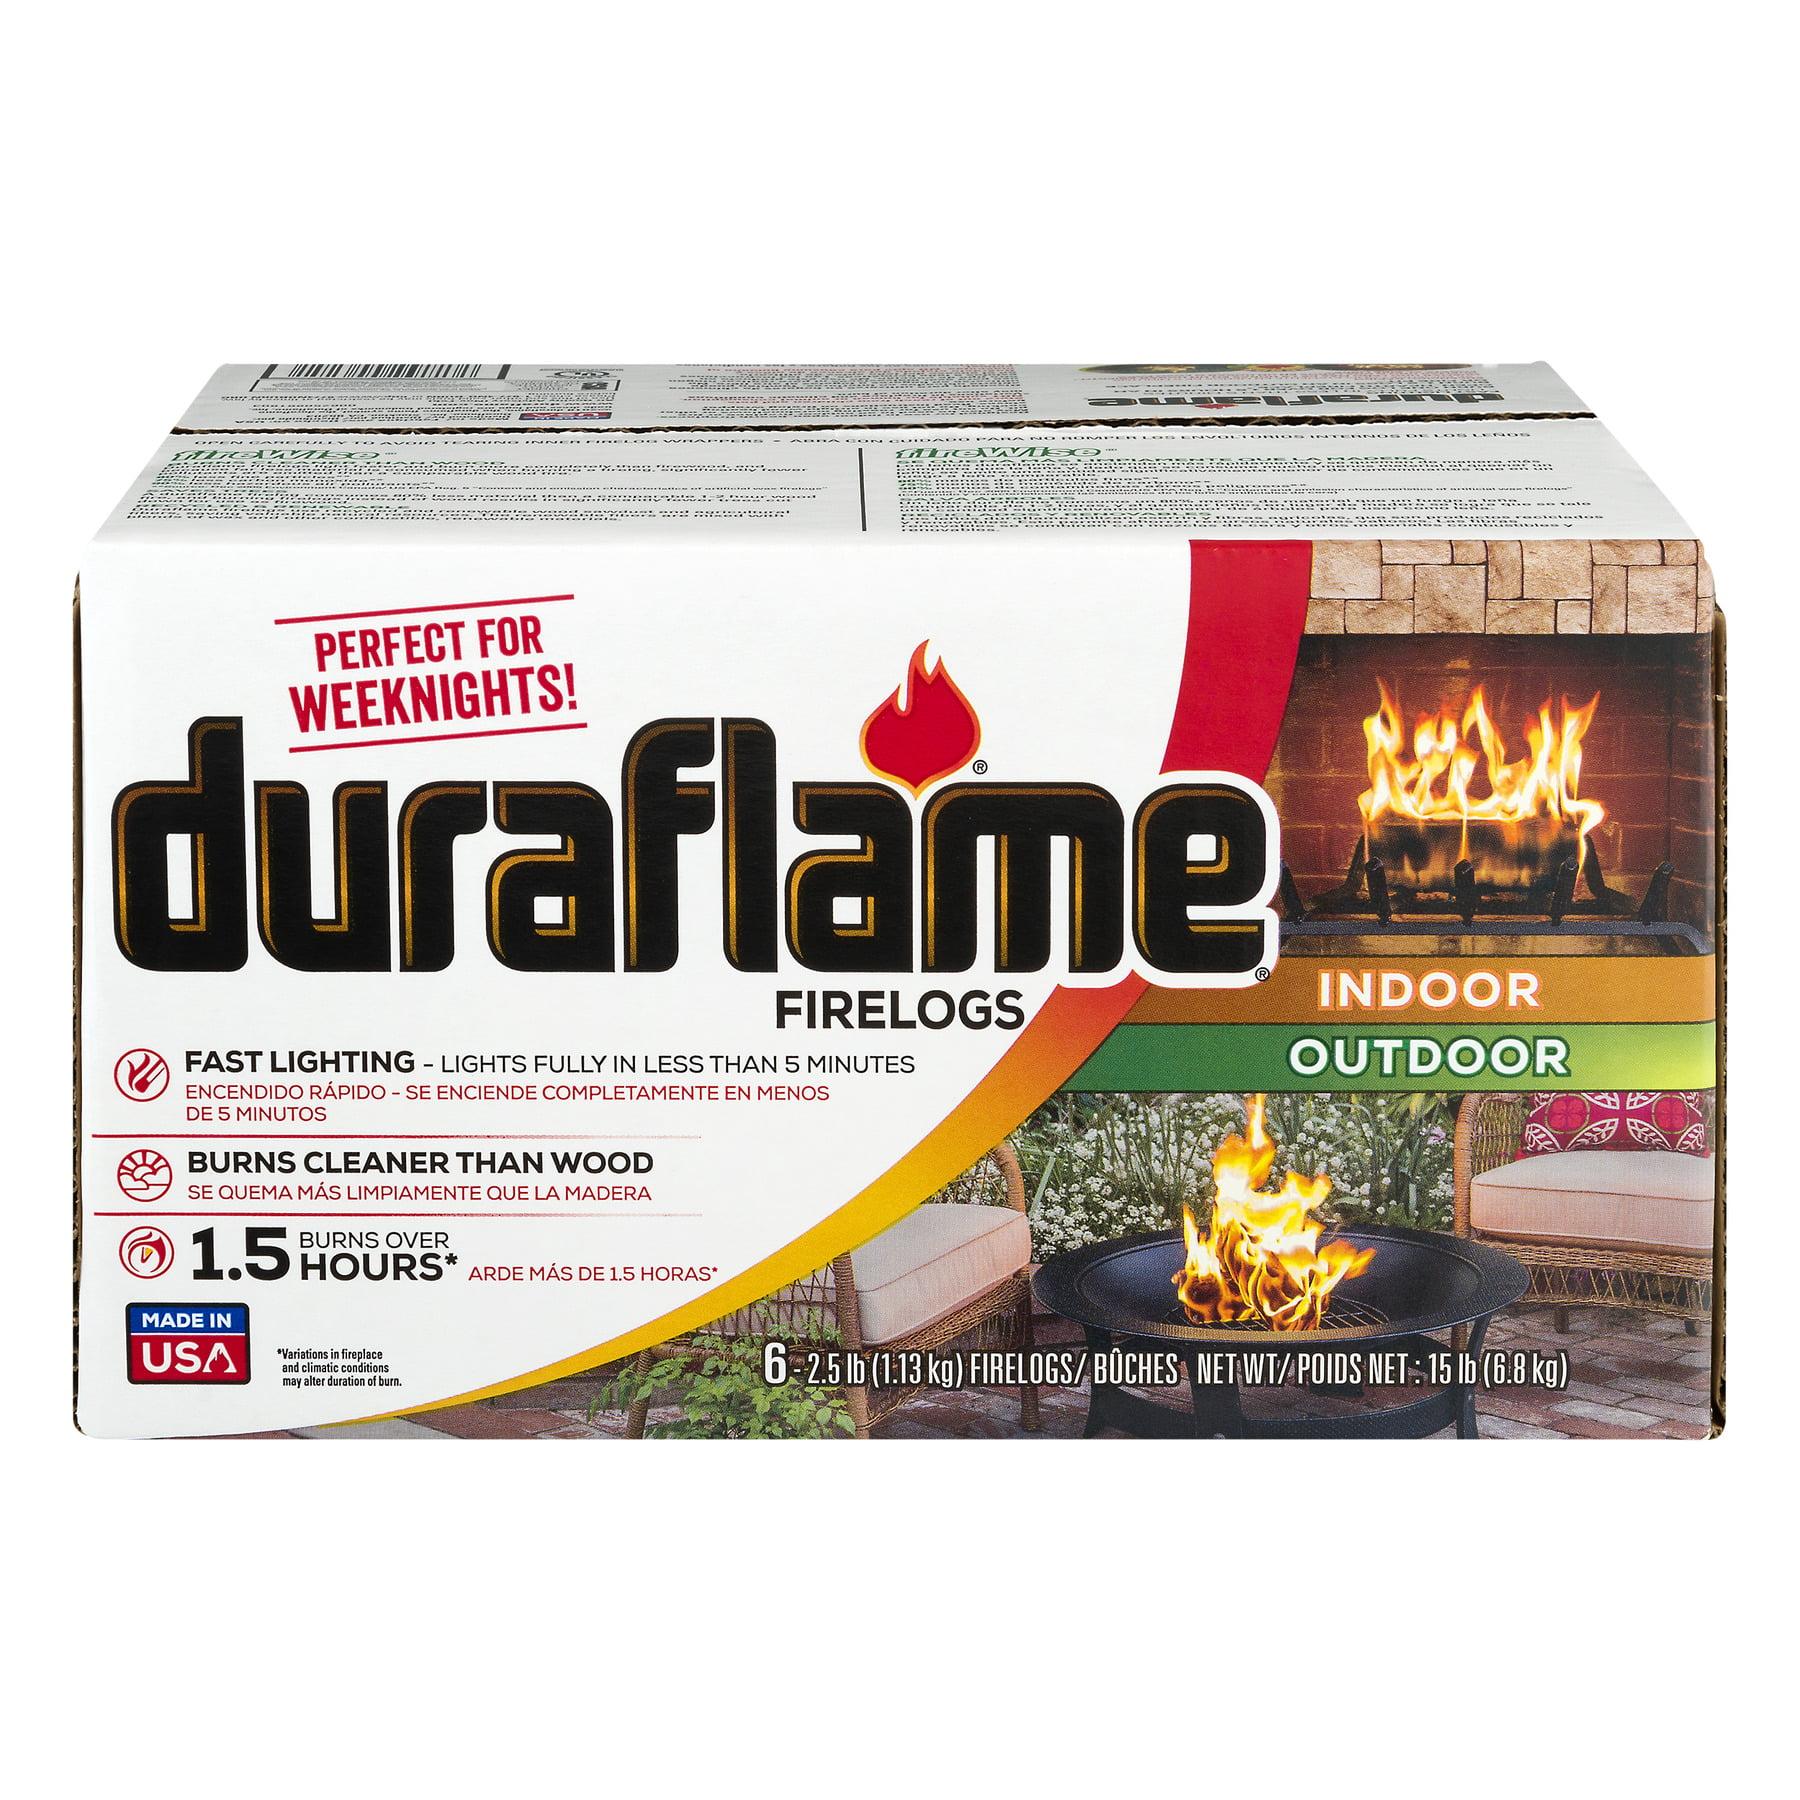 Duraflame 2.5lb 1.5-hr Firelog - 6 Pack